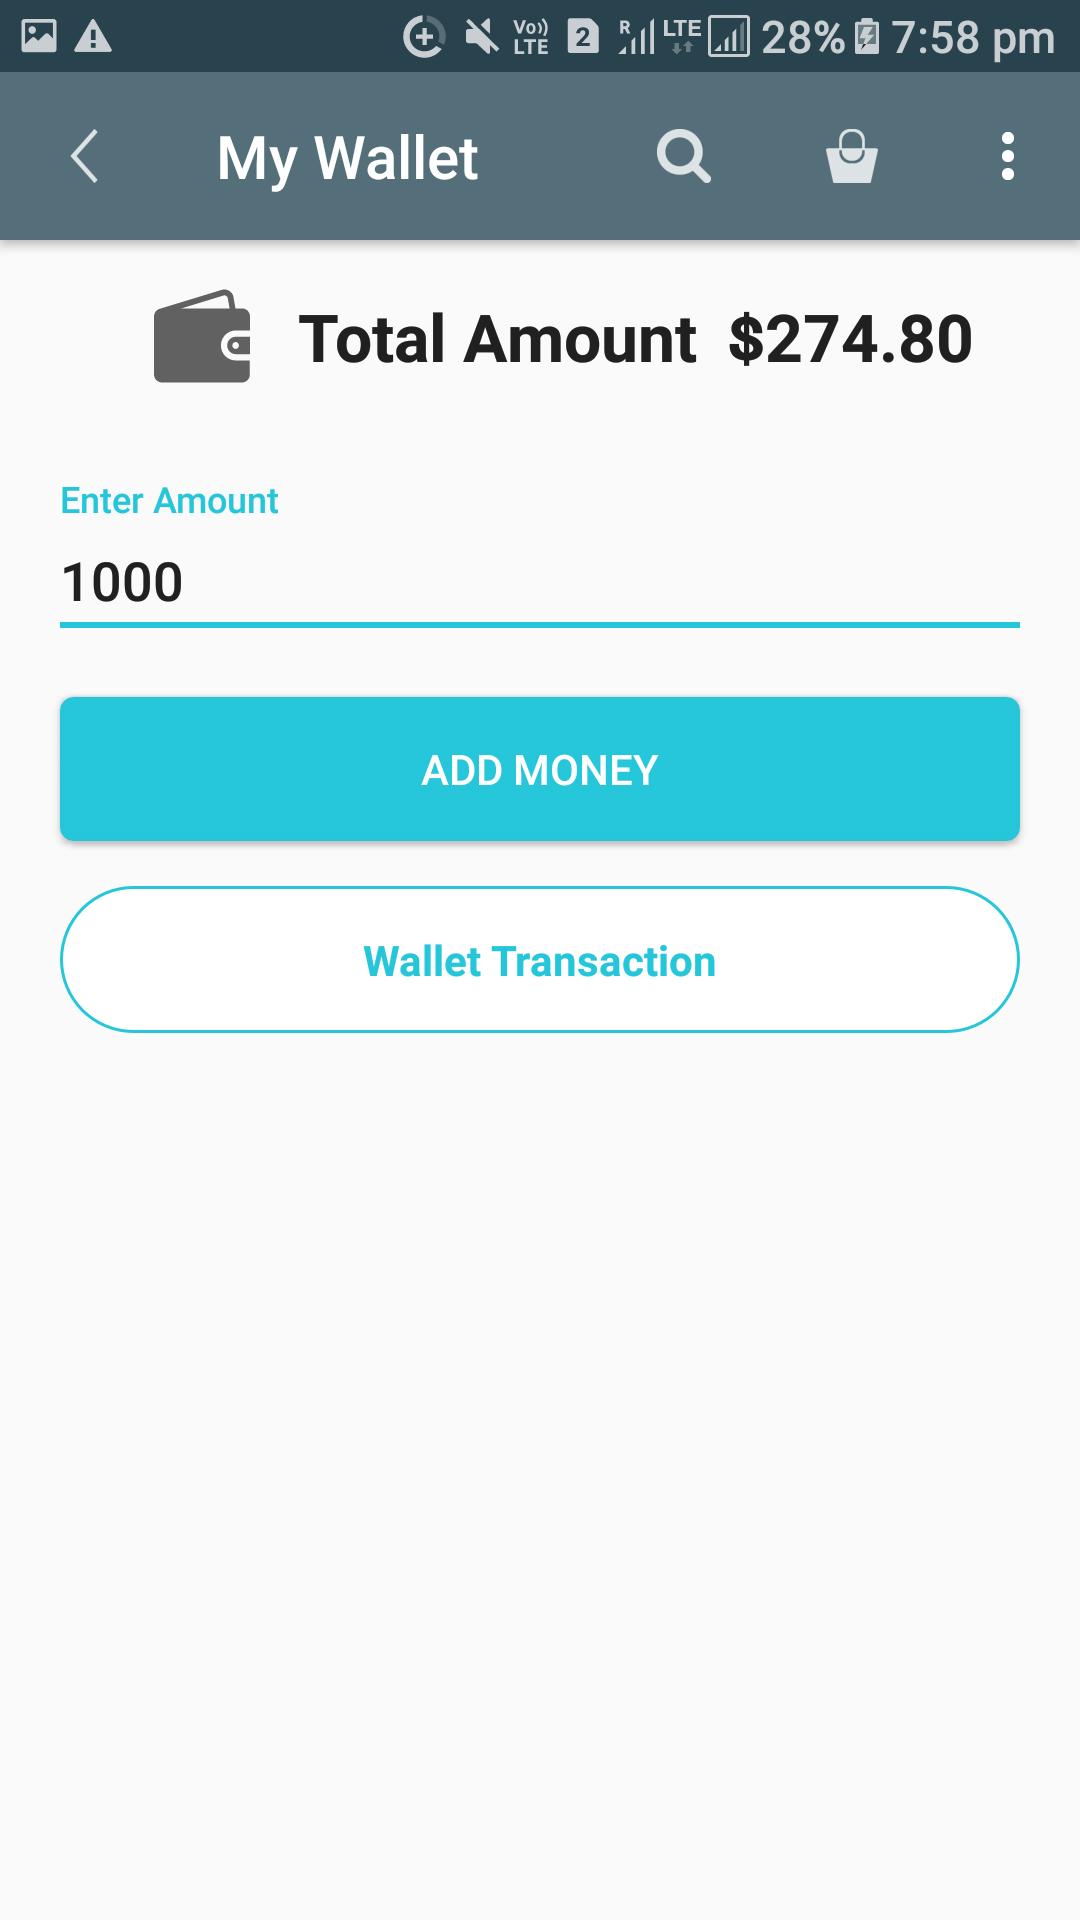 Opencart Mobikilul Wallet - Add Money to Wallet Process